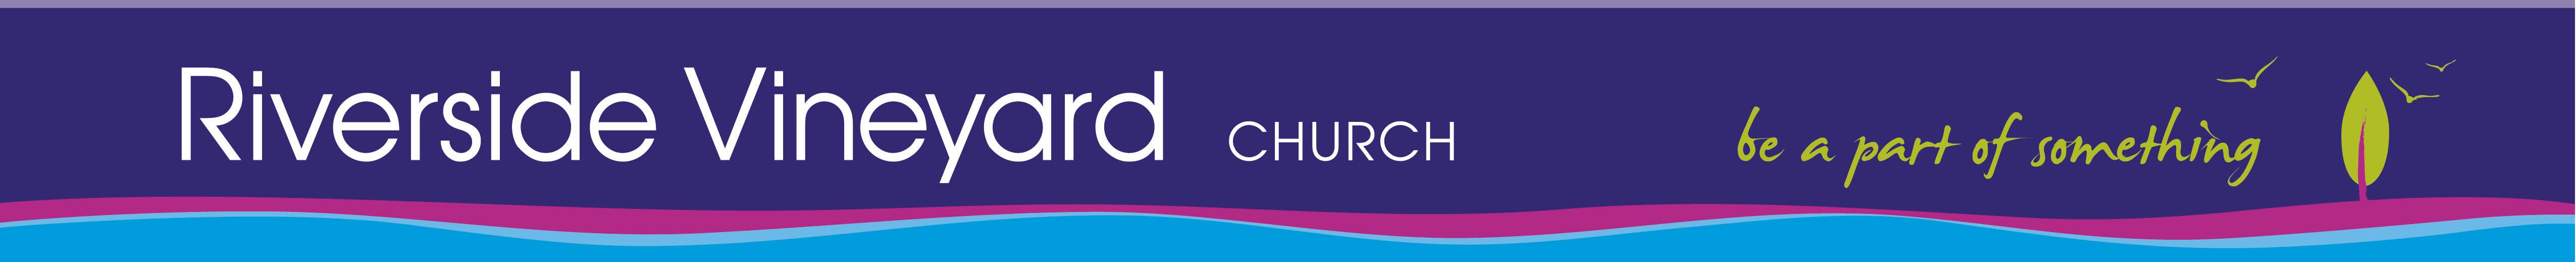 Riverside Vineyard Church - Be a Part of Something